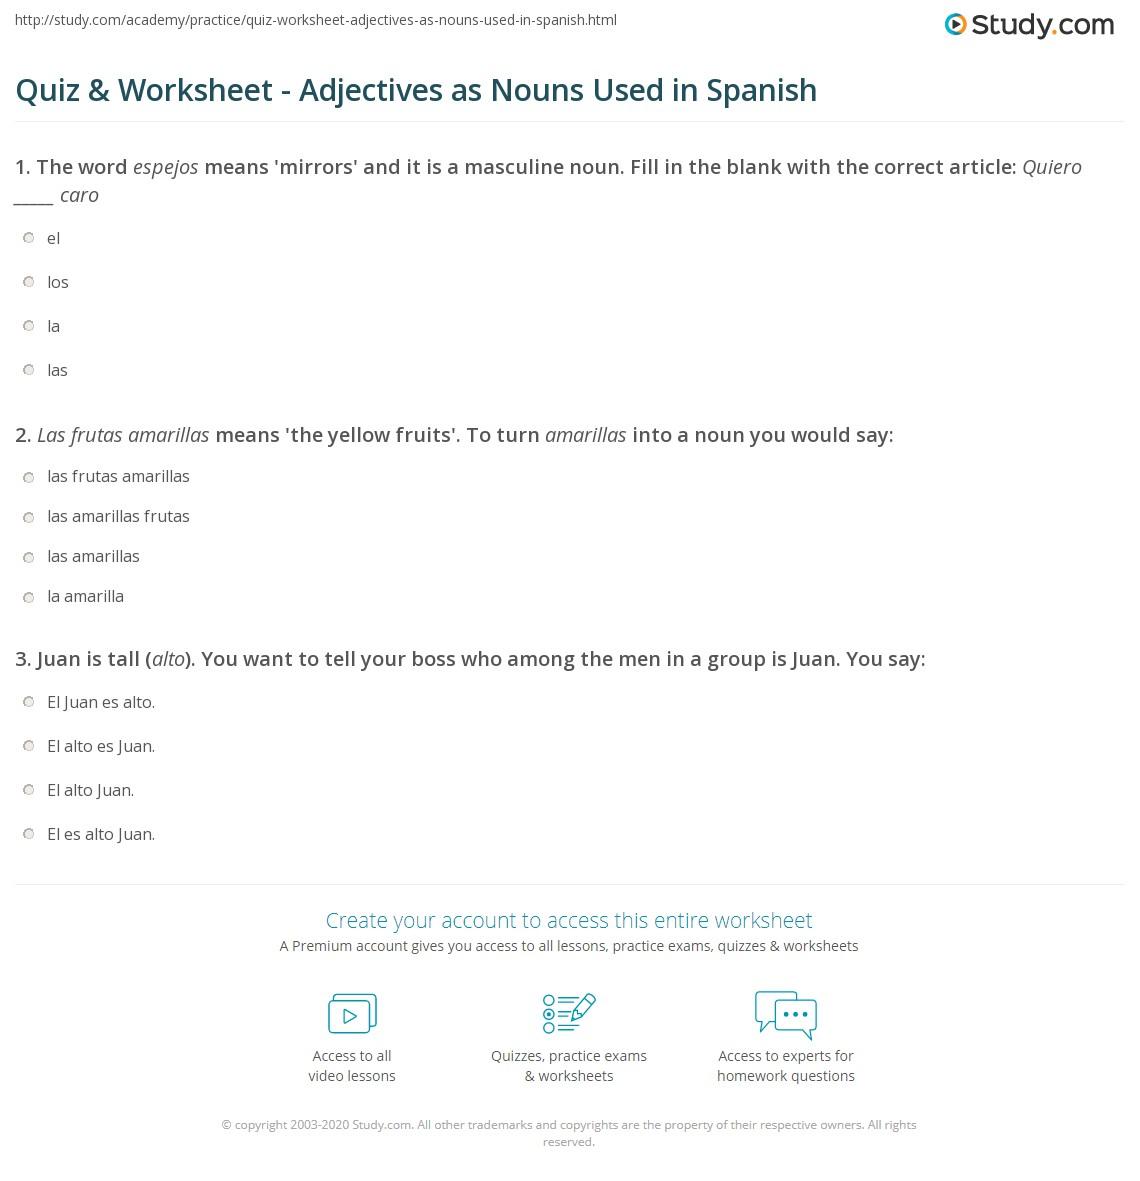 worksheet Nouns Used As Adjectives Worksheet quiz worksheet adjectives as nouns used in spanish study com print using worksheet